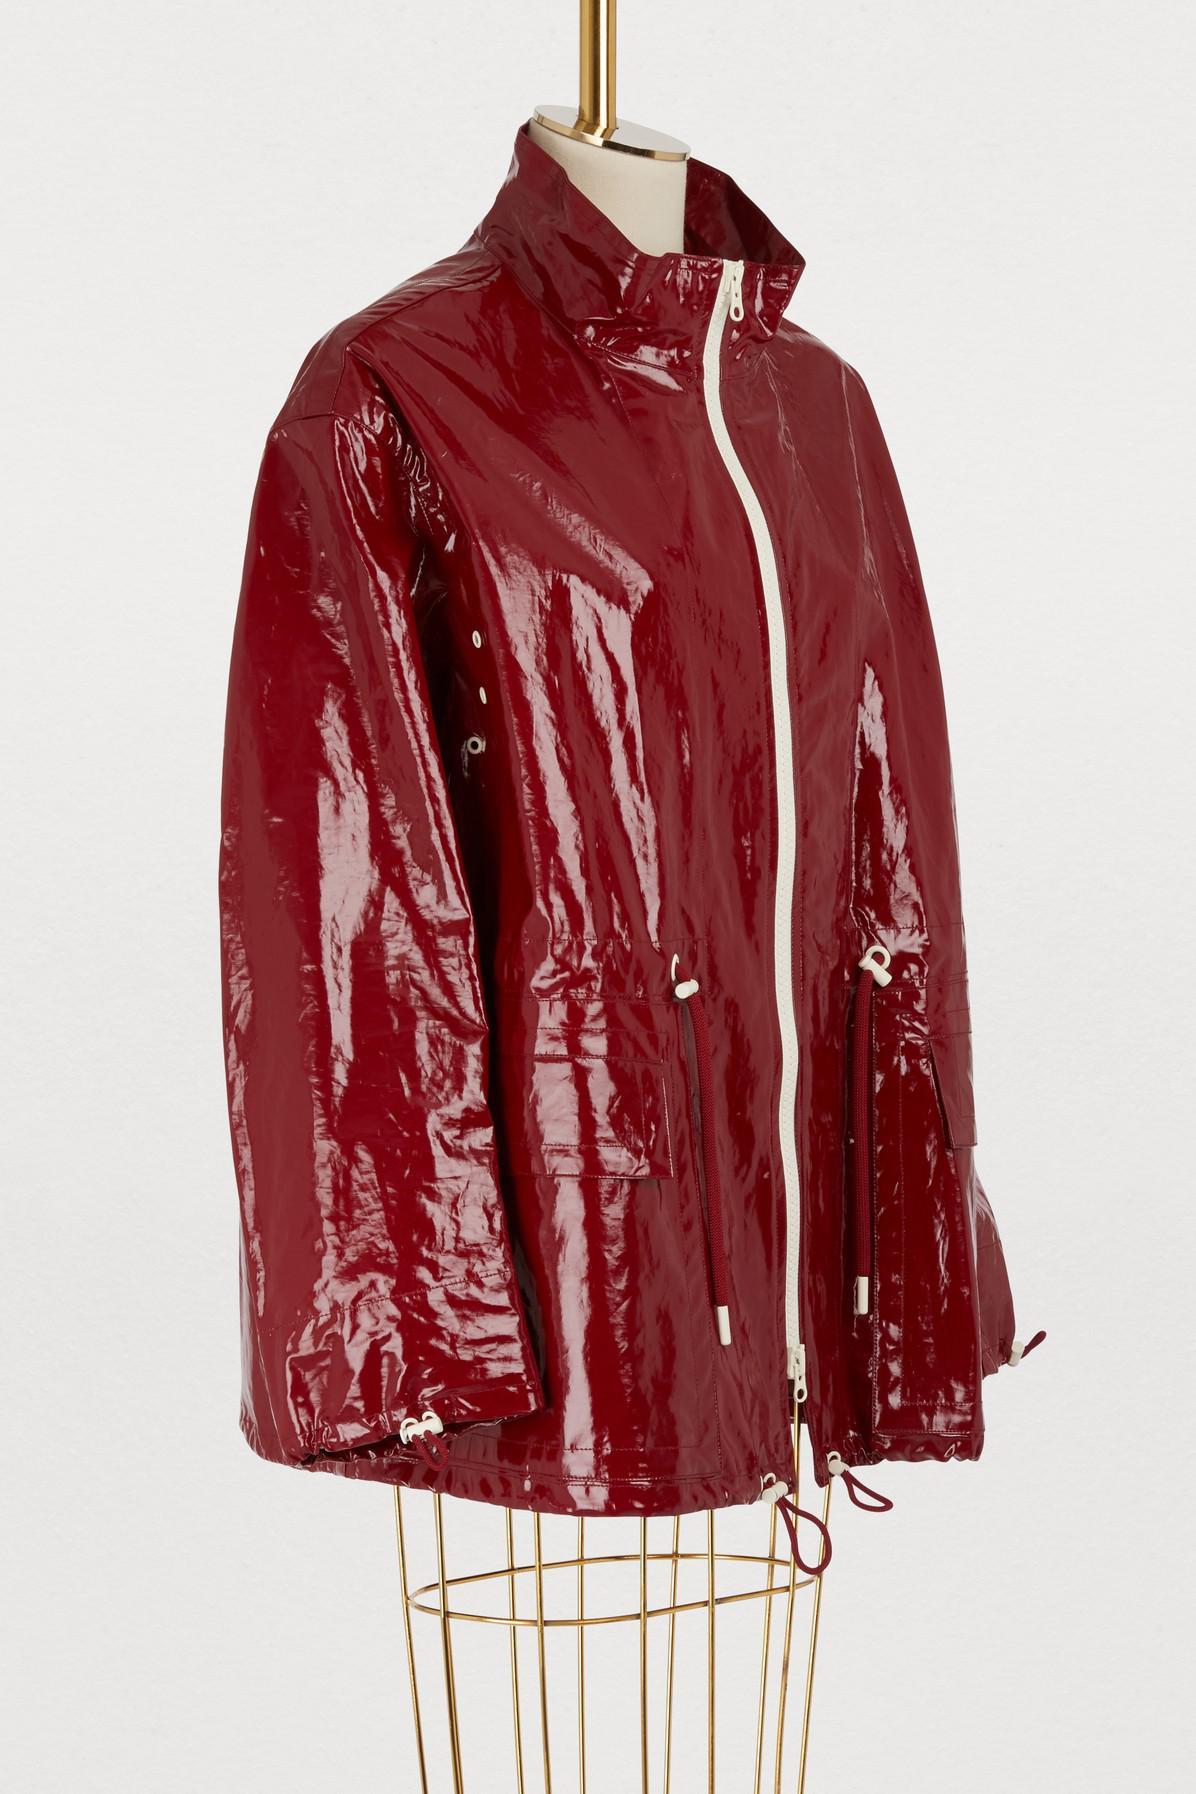 newest 1013d d8c15 isabel-marant-BURGUNDY-Cotton-And-Linen-Enzo-Jacket.jpeg